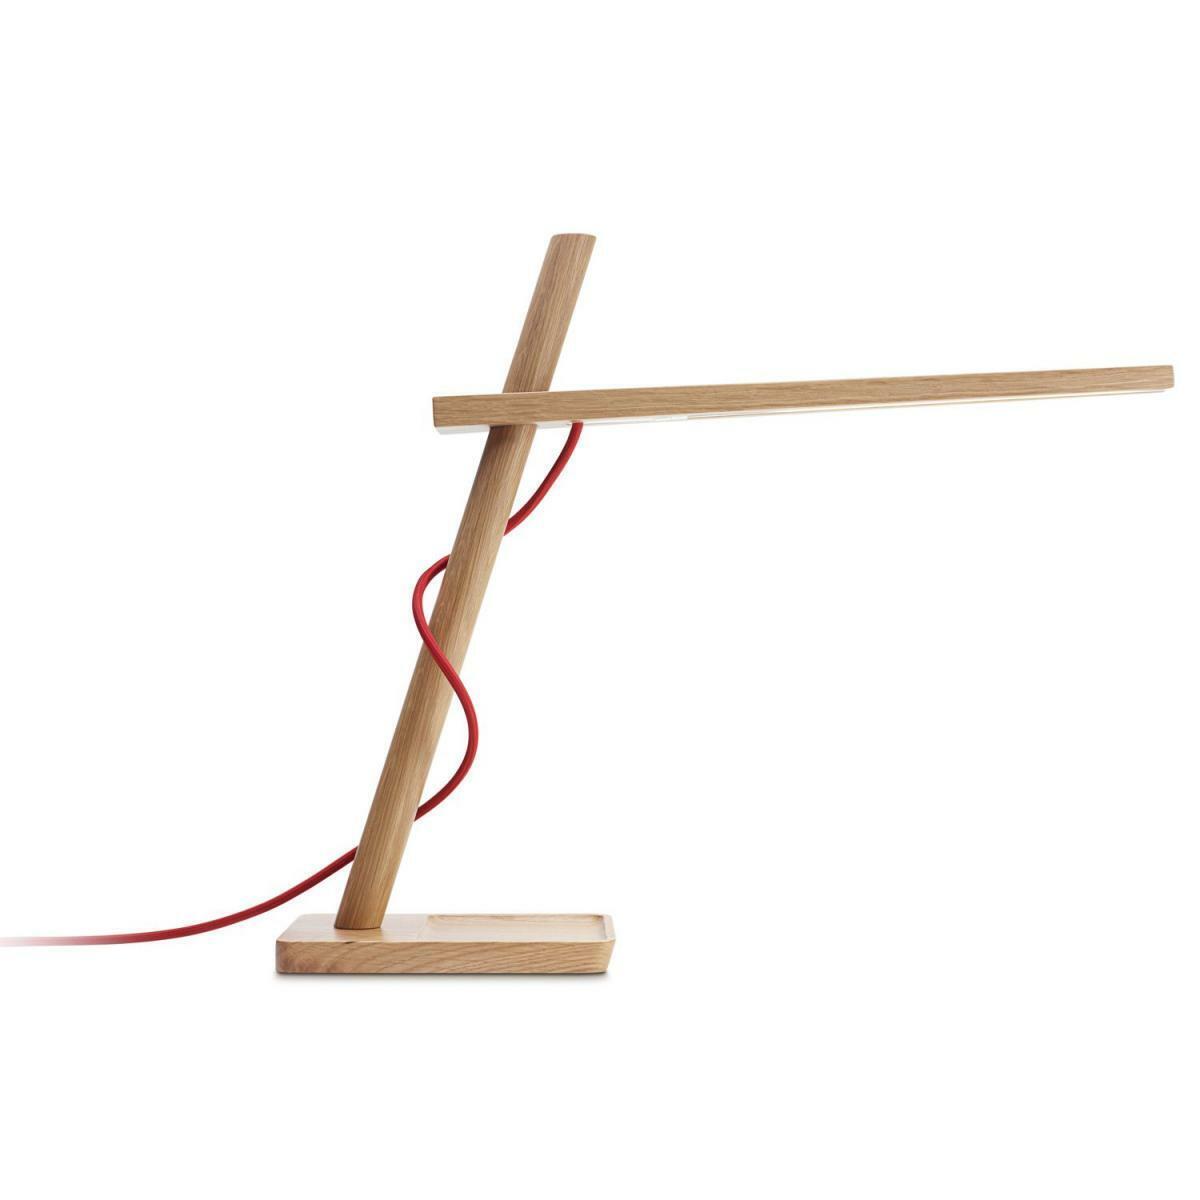 Pablo Design Clamp Mini Eiche LED Tischleuchte - EEK  A+ - Neu - Original